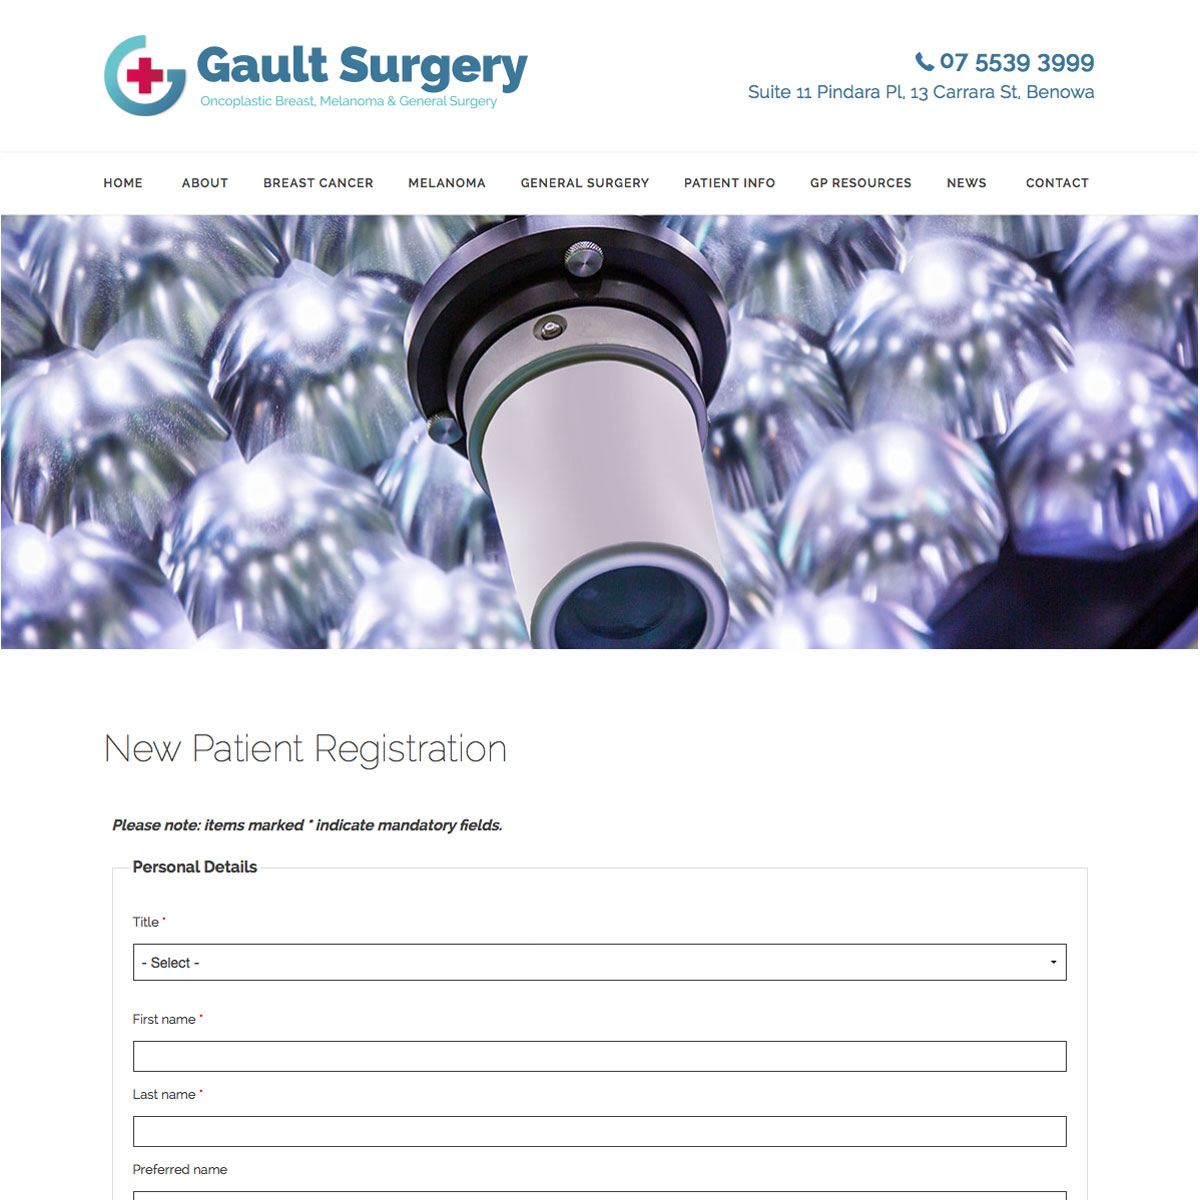 Gault Surgery New Patient Registration